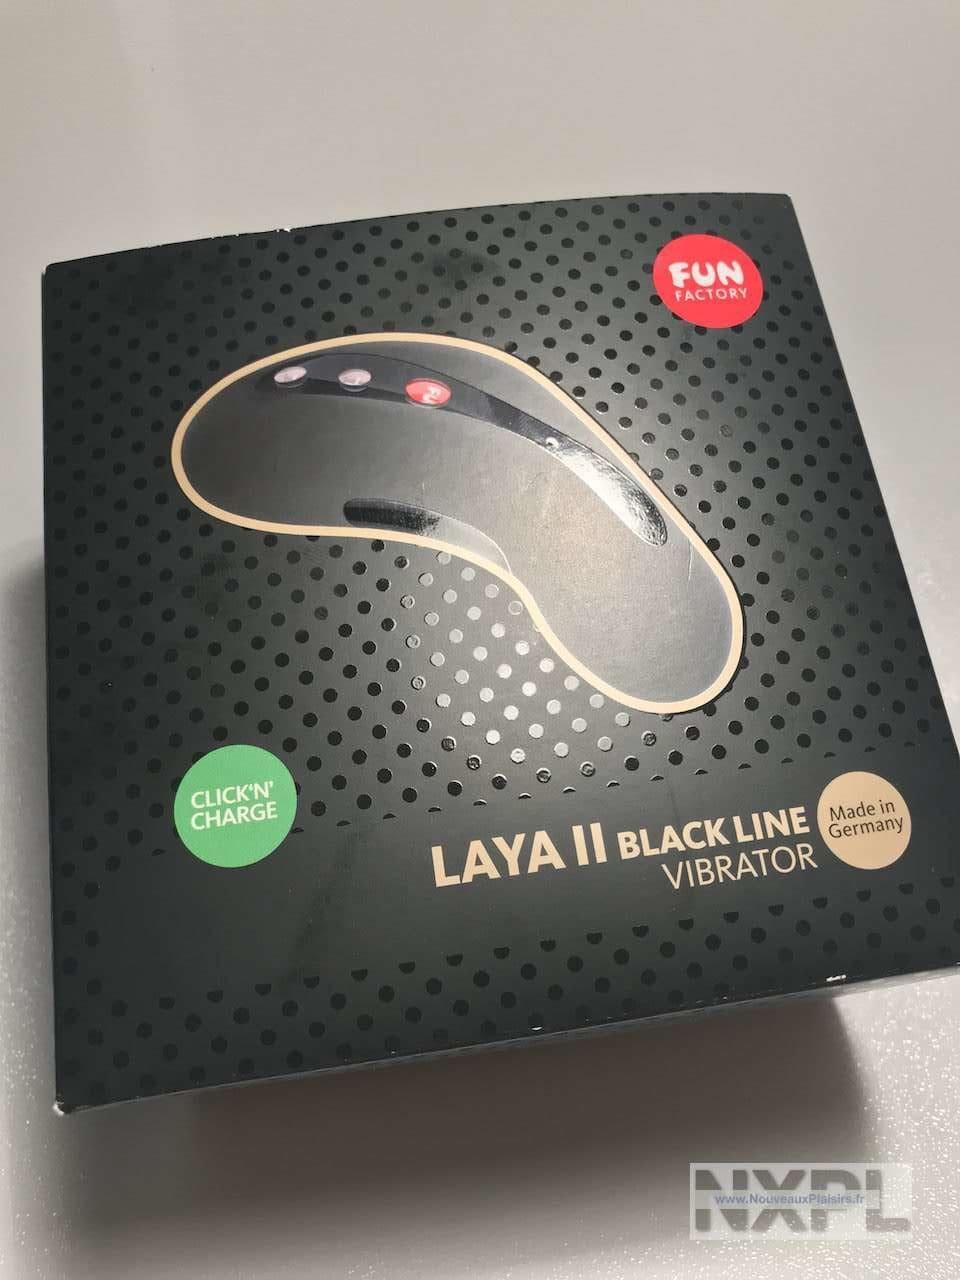 Test du stimulateur clitoridien Fun Factory Laya 2 Blackline - NXPL